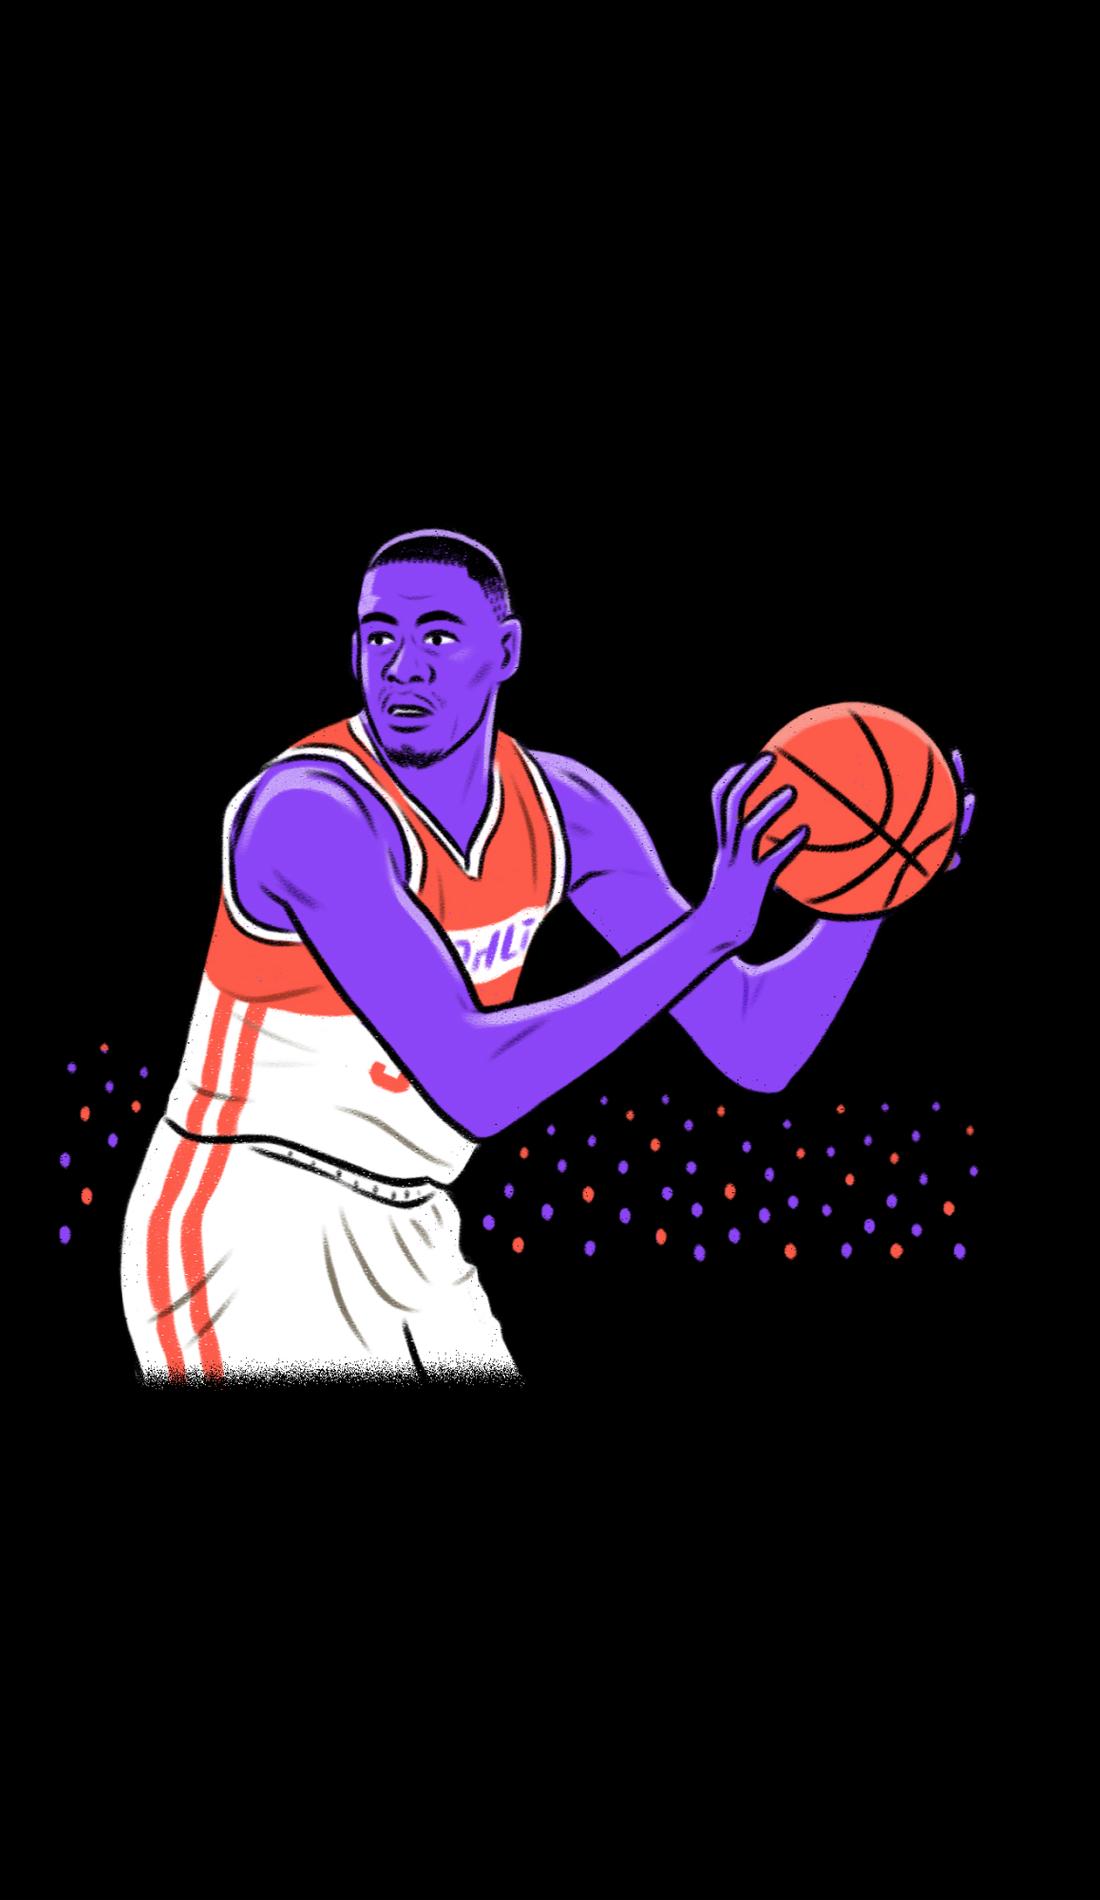 A Southern Utah Thunderbirds Basketball live event